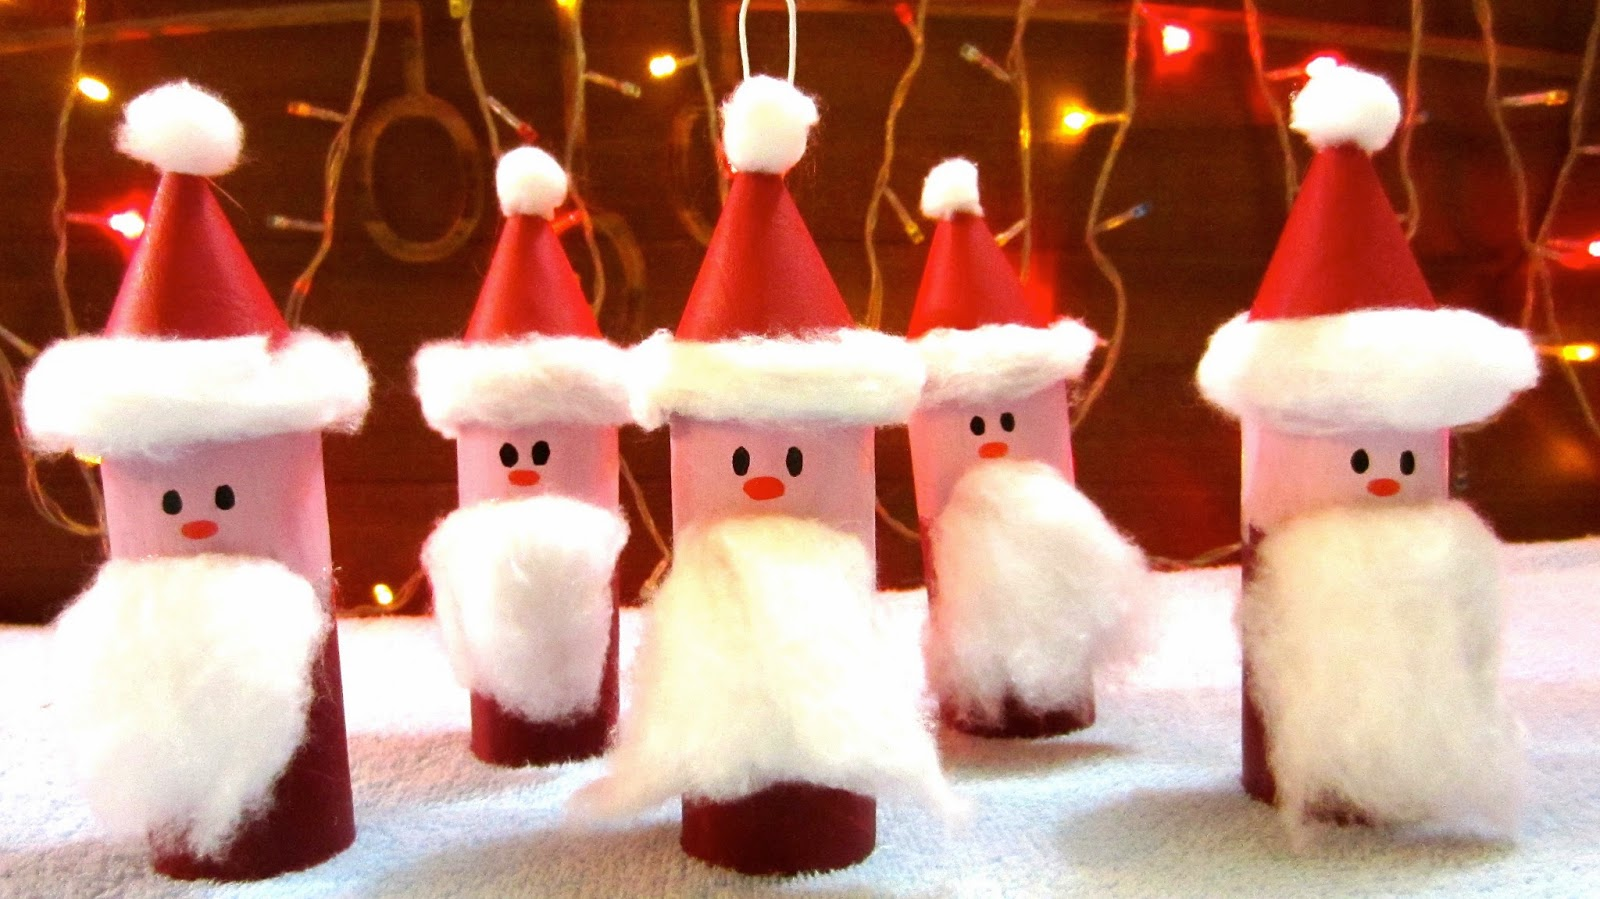 100 Penguin Home Decor Polar Bear Nursery Art Set  : santaJPG from ll100proof.com size 1600 x 899 jpeg 221kB